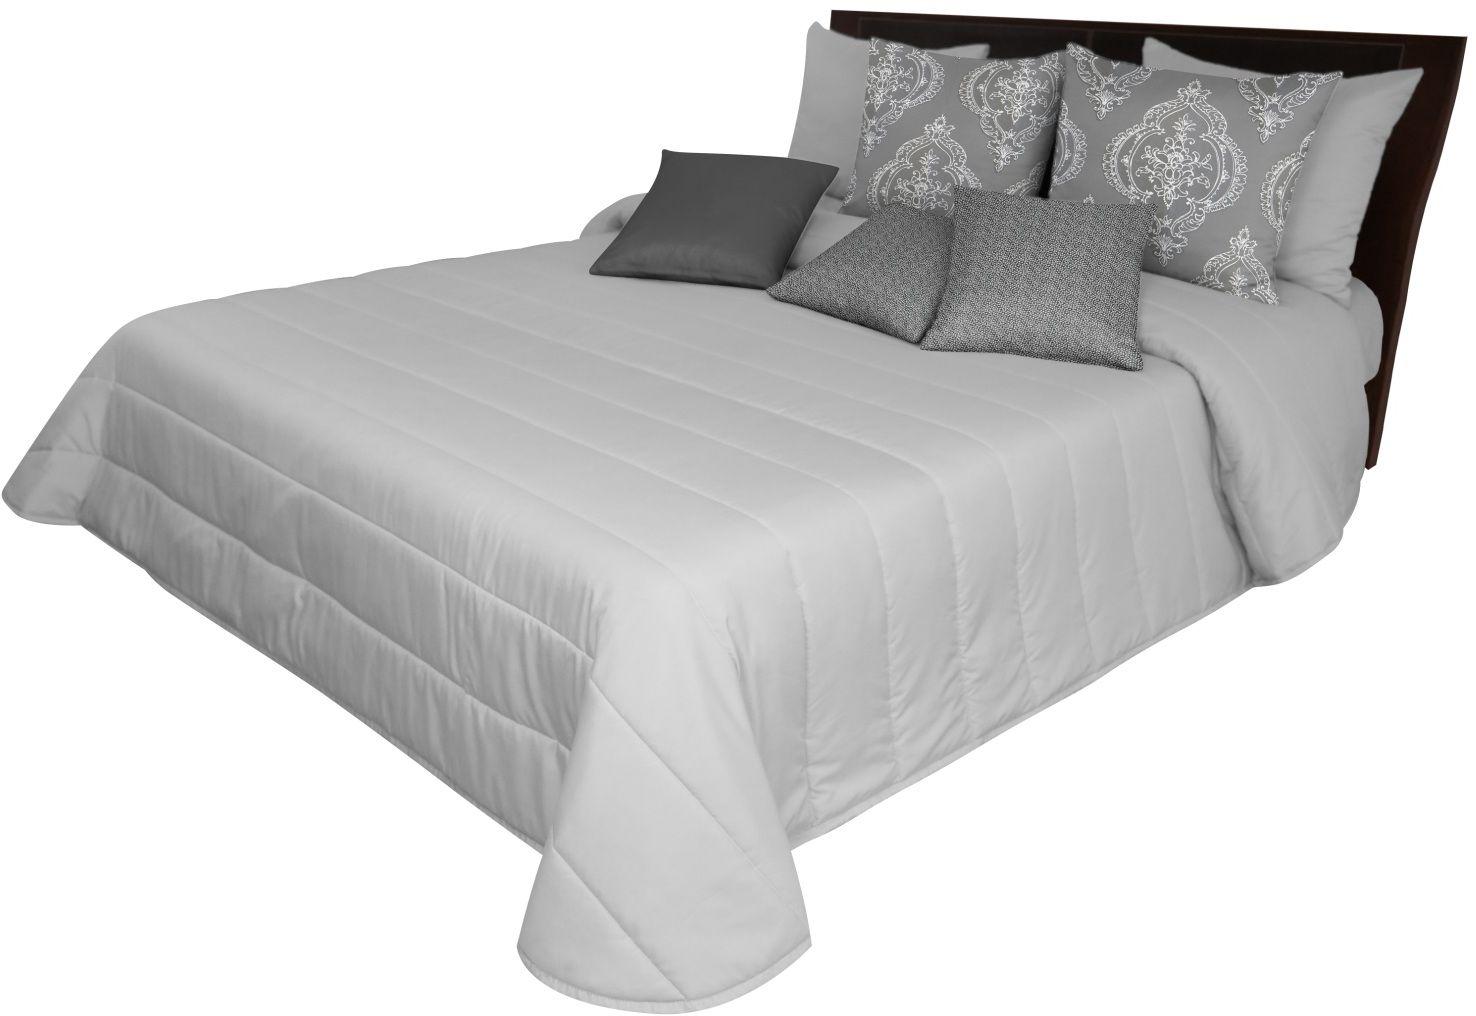 Narzuta pikowana na łóżko NMF-01 Mariall